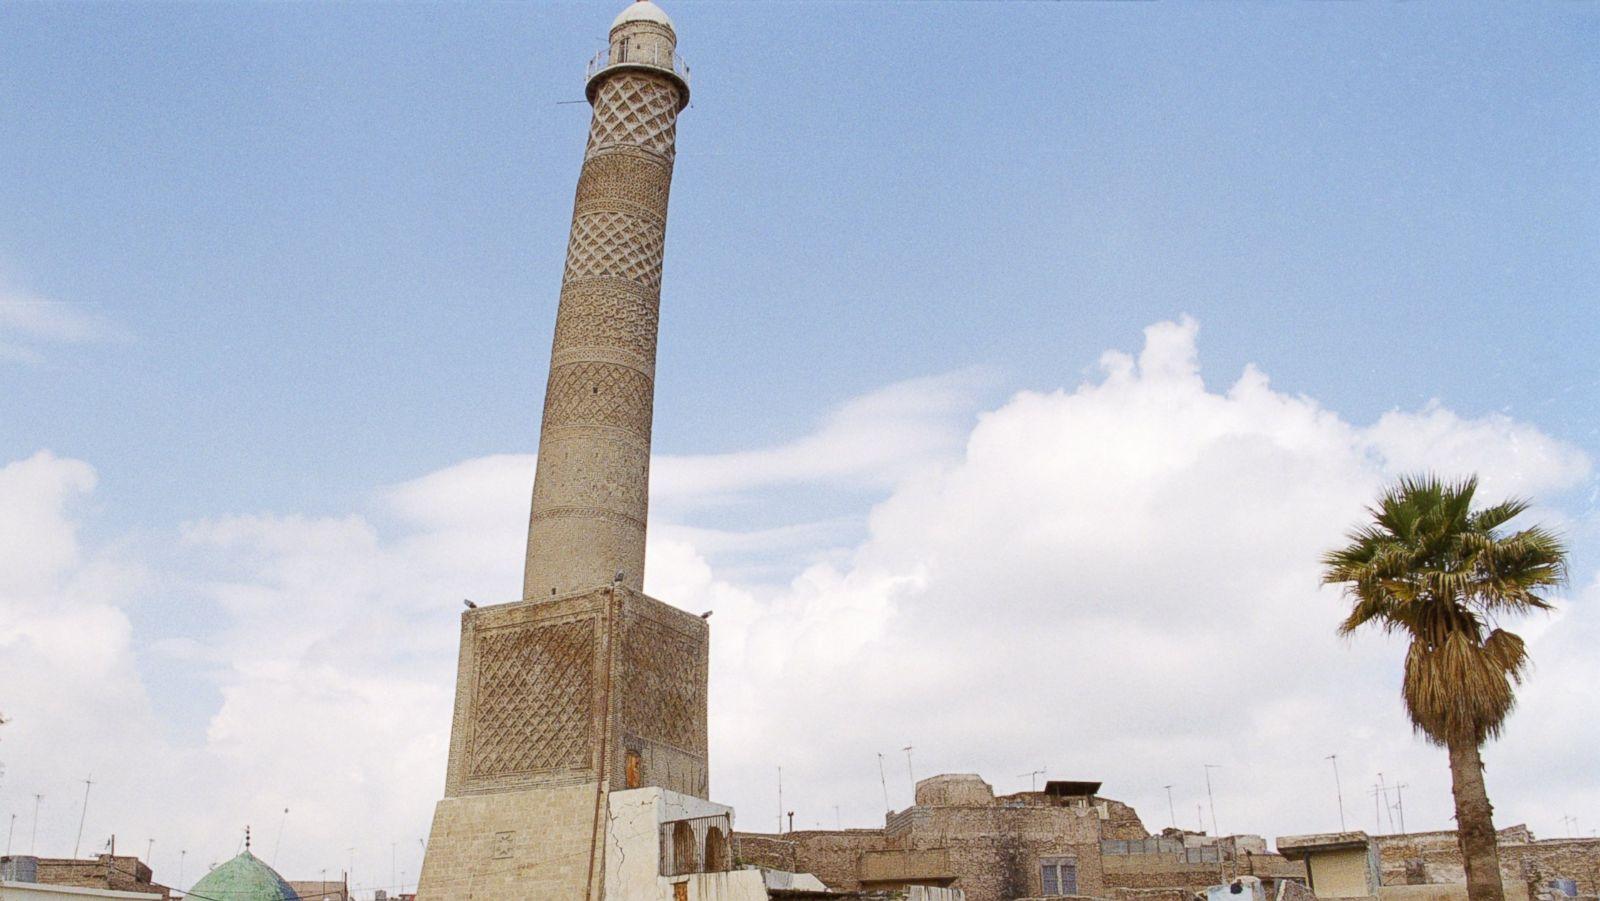 MInaret of the Great Mosque of Al-Nuri Mosul